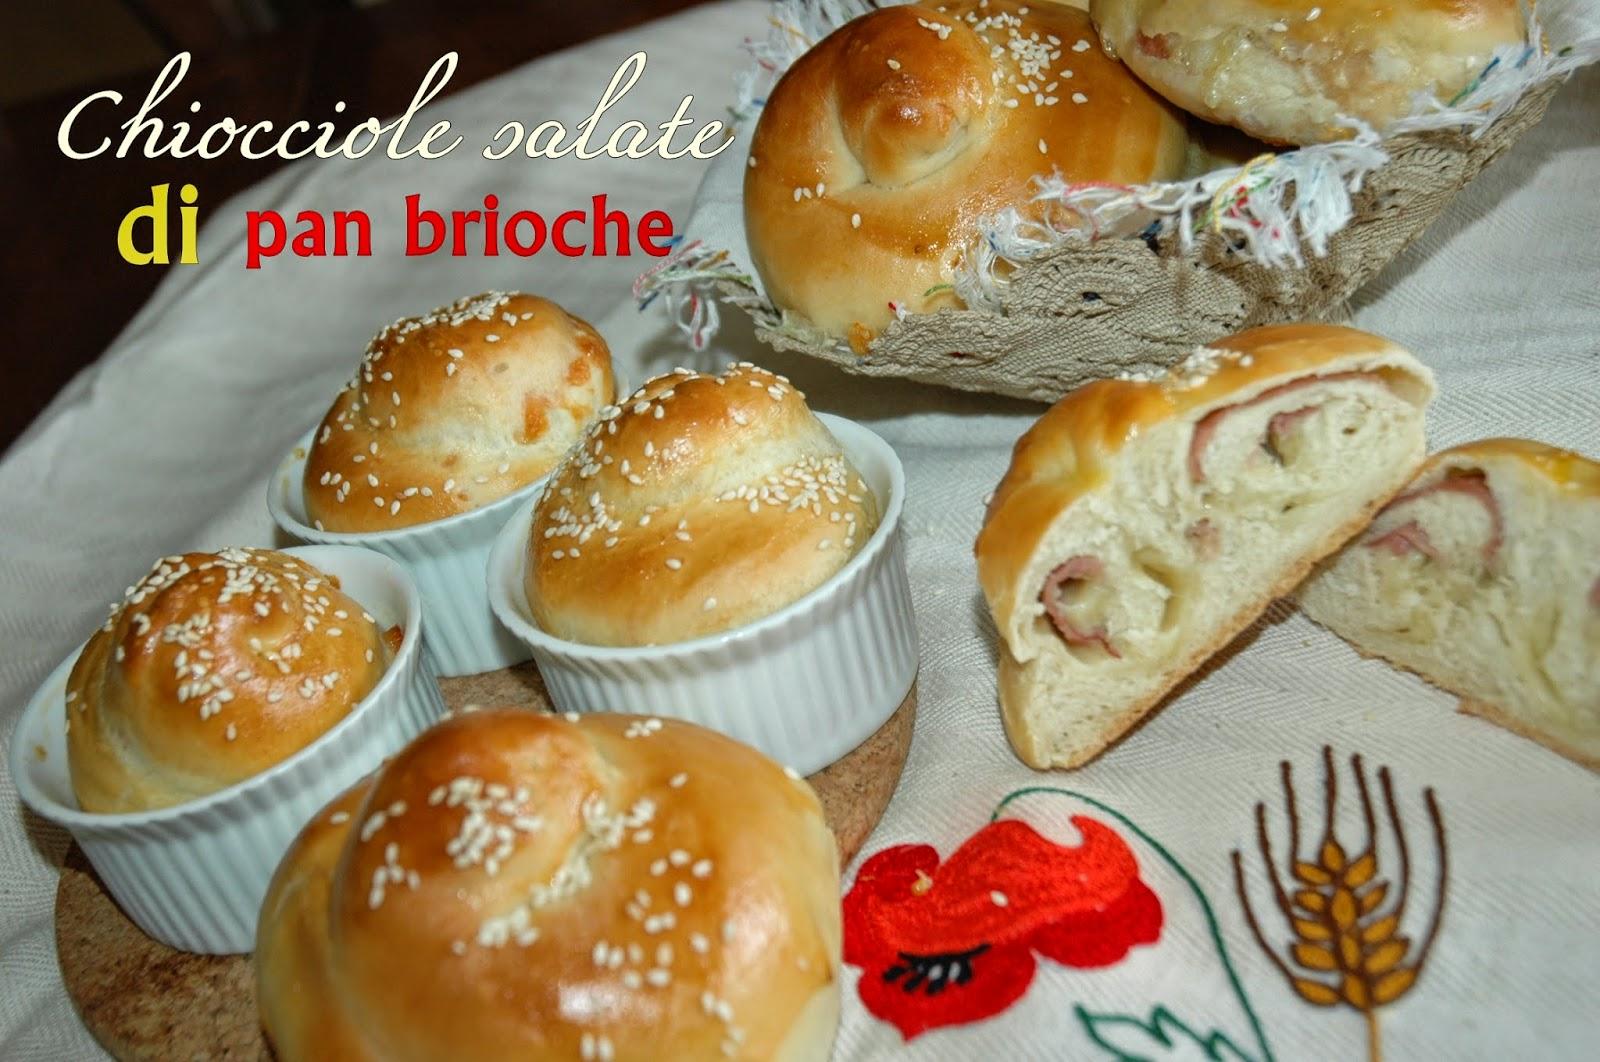 chiocciole salate di pan brioche a lievitazione naturale